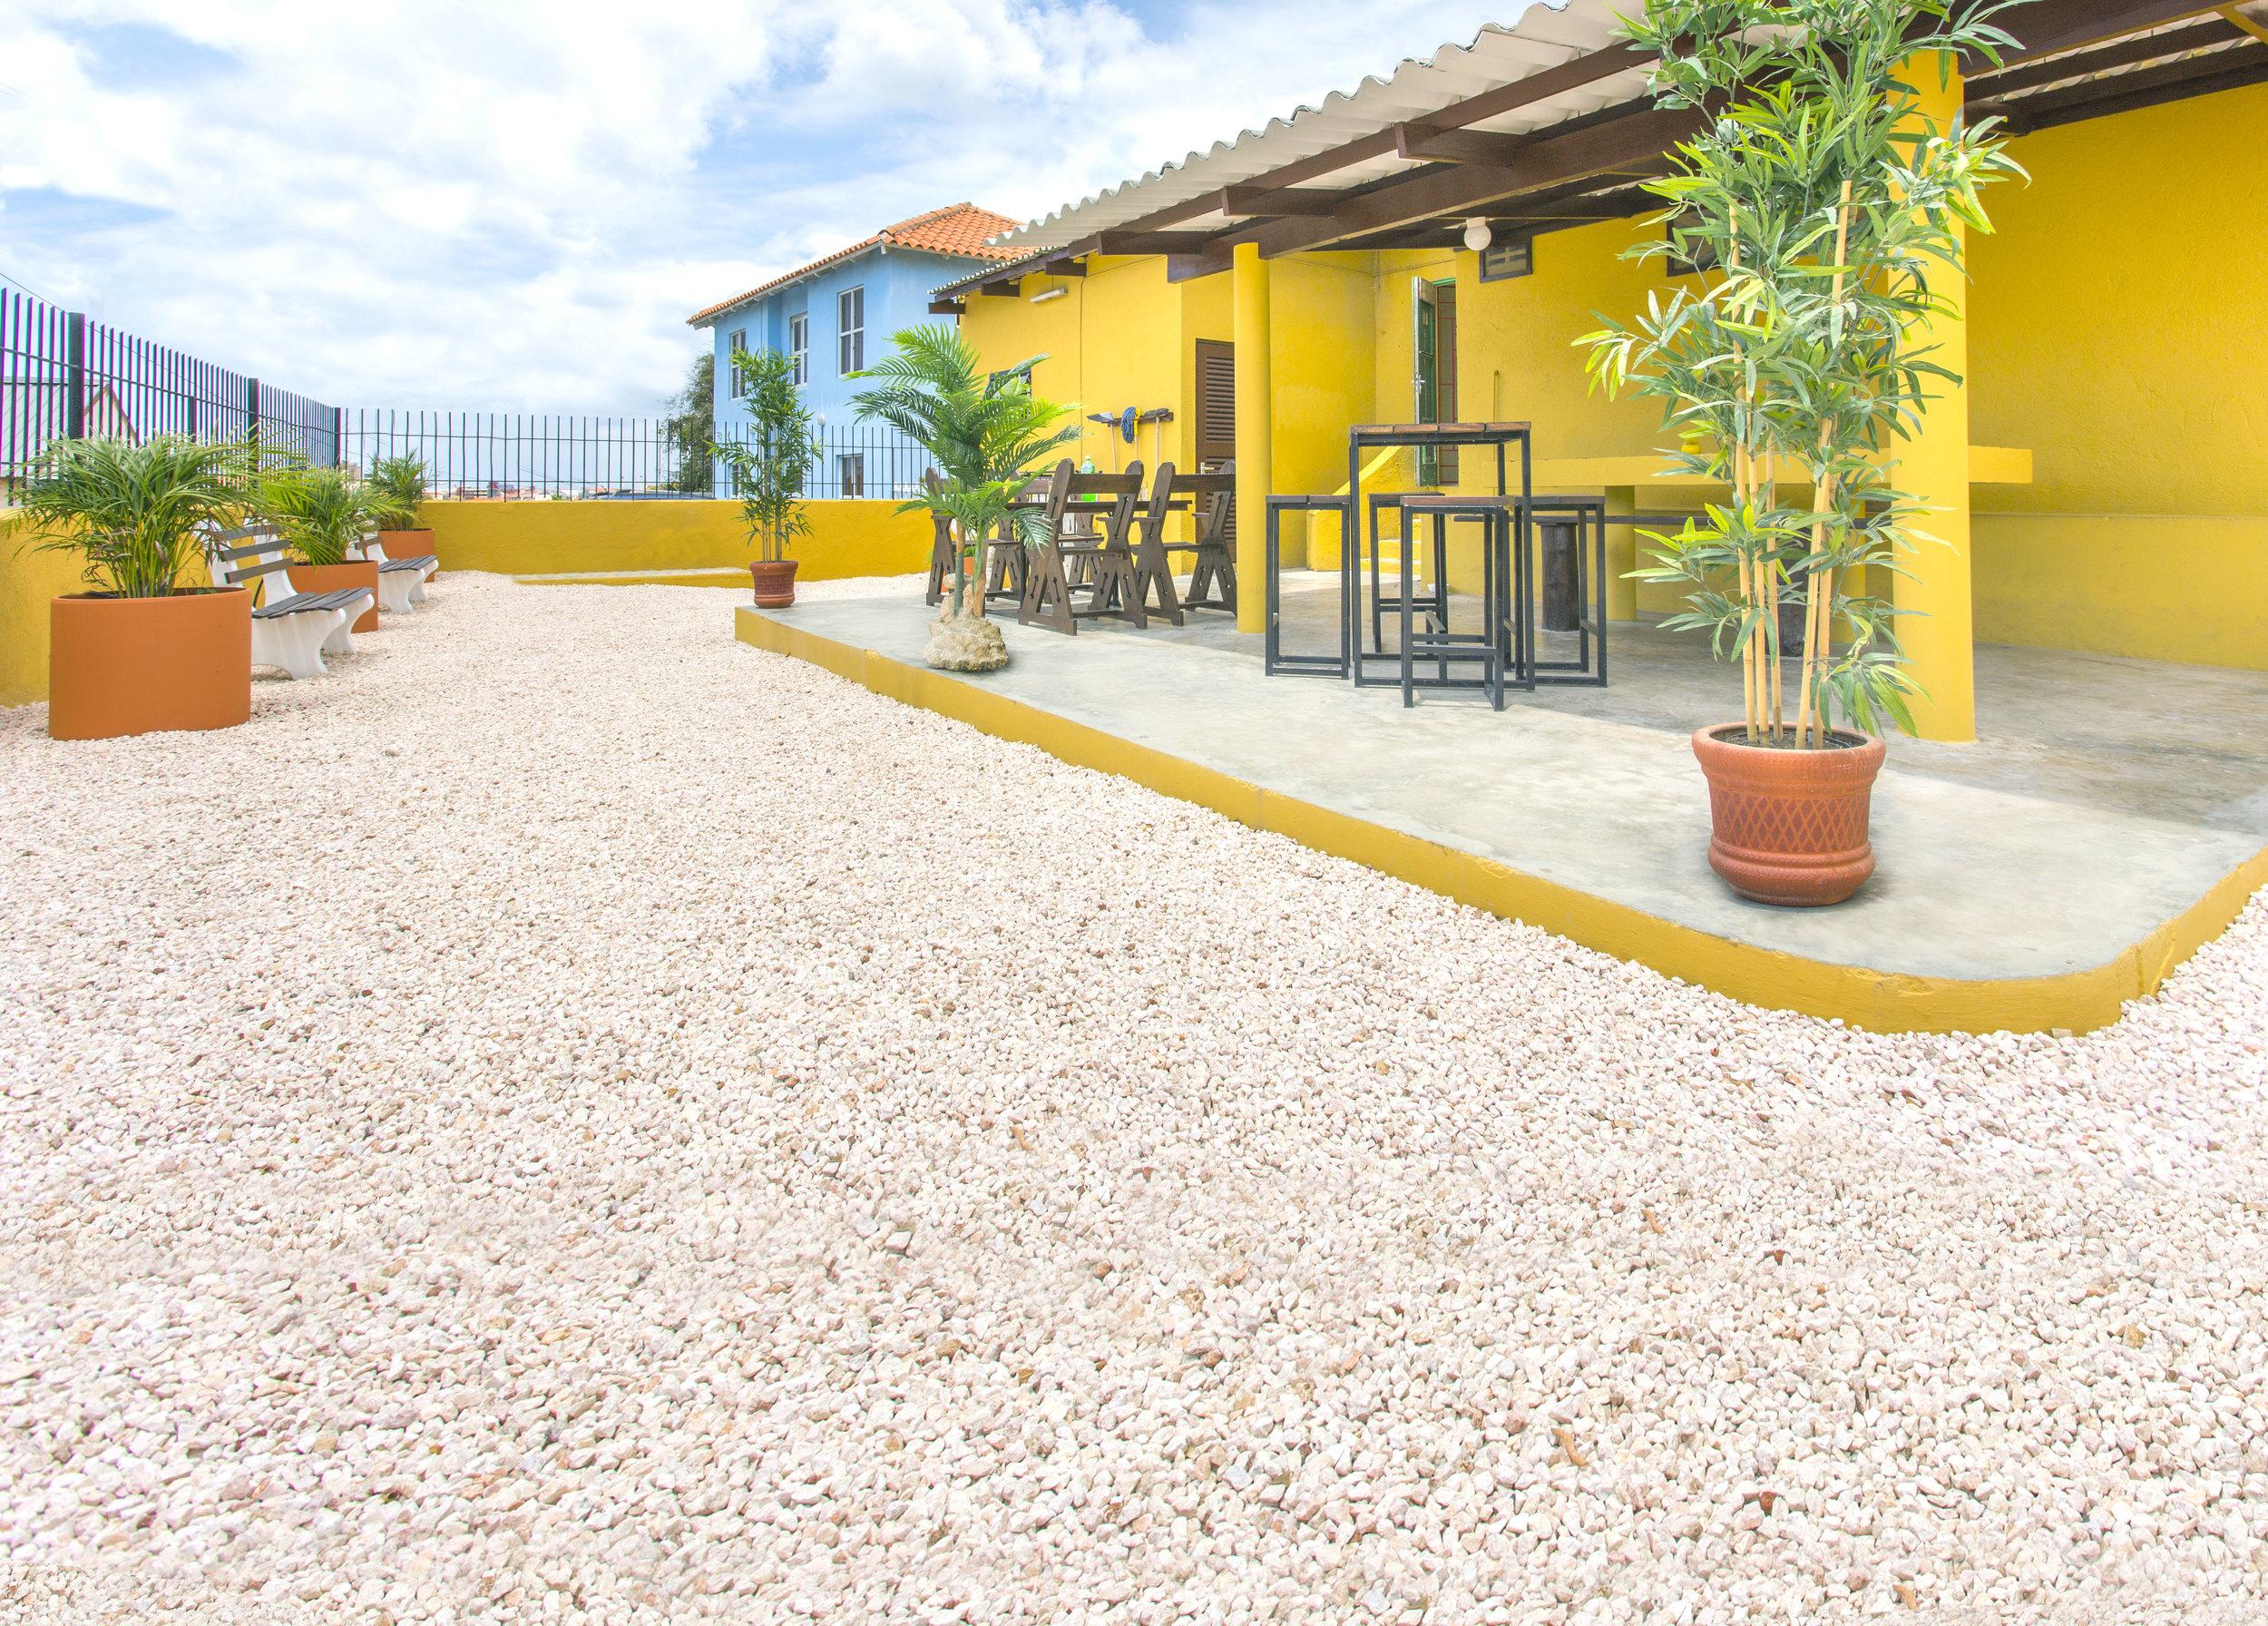 StageDesk-Curaçao-Stagehuis-BergAltena-Pelikaan-huis06.jpg